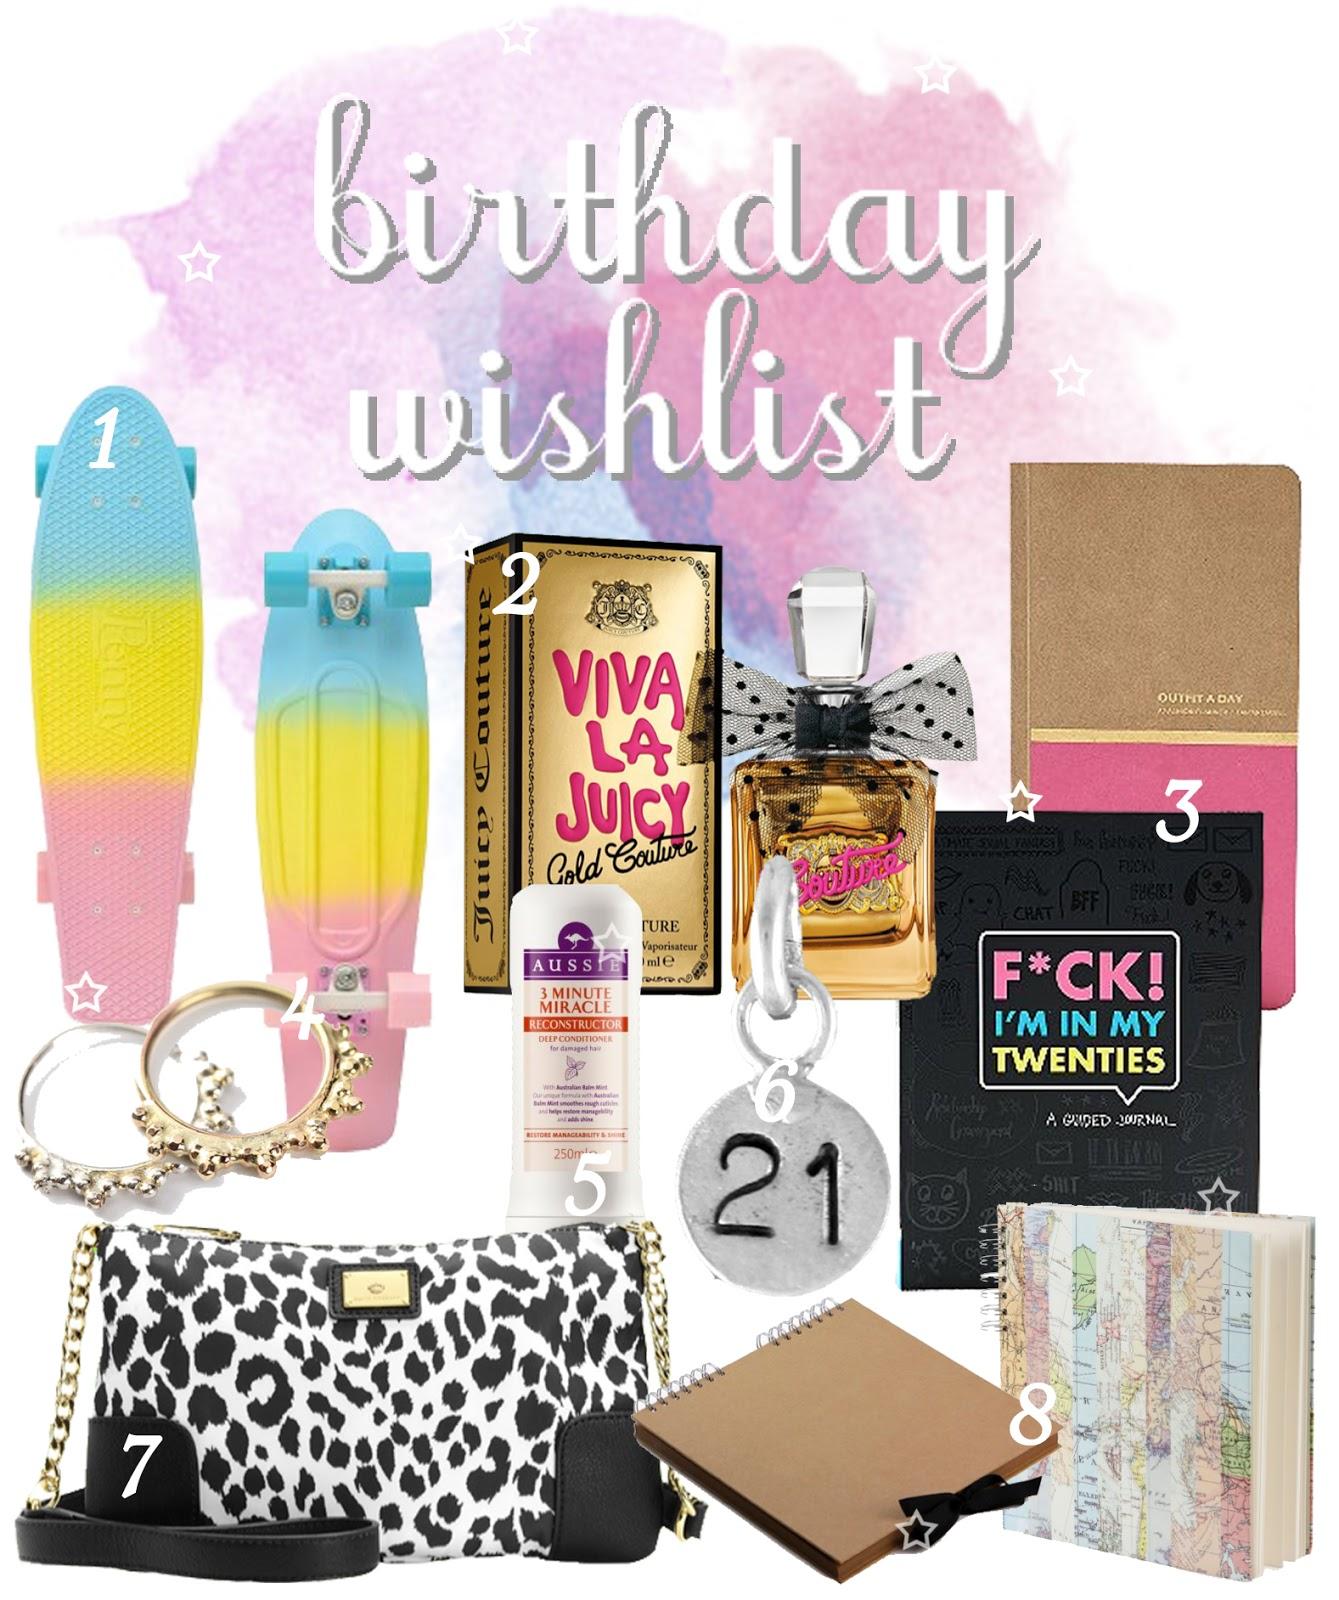 'Bambella: 21st Birthday Gift Wish List